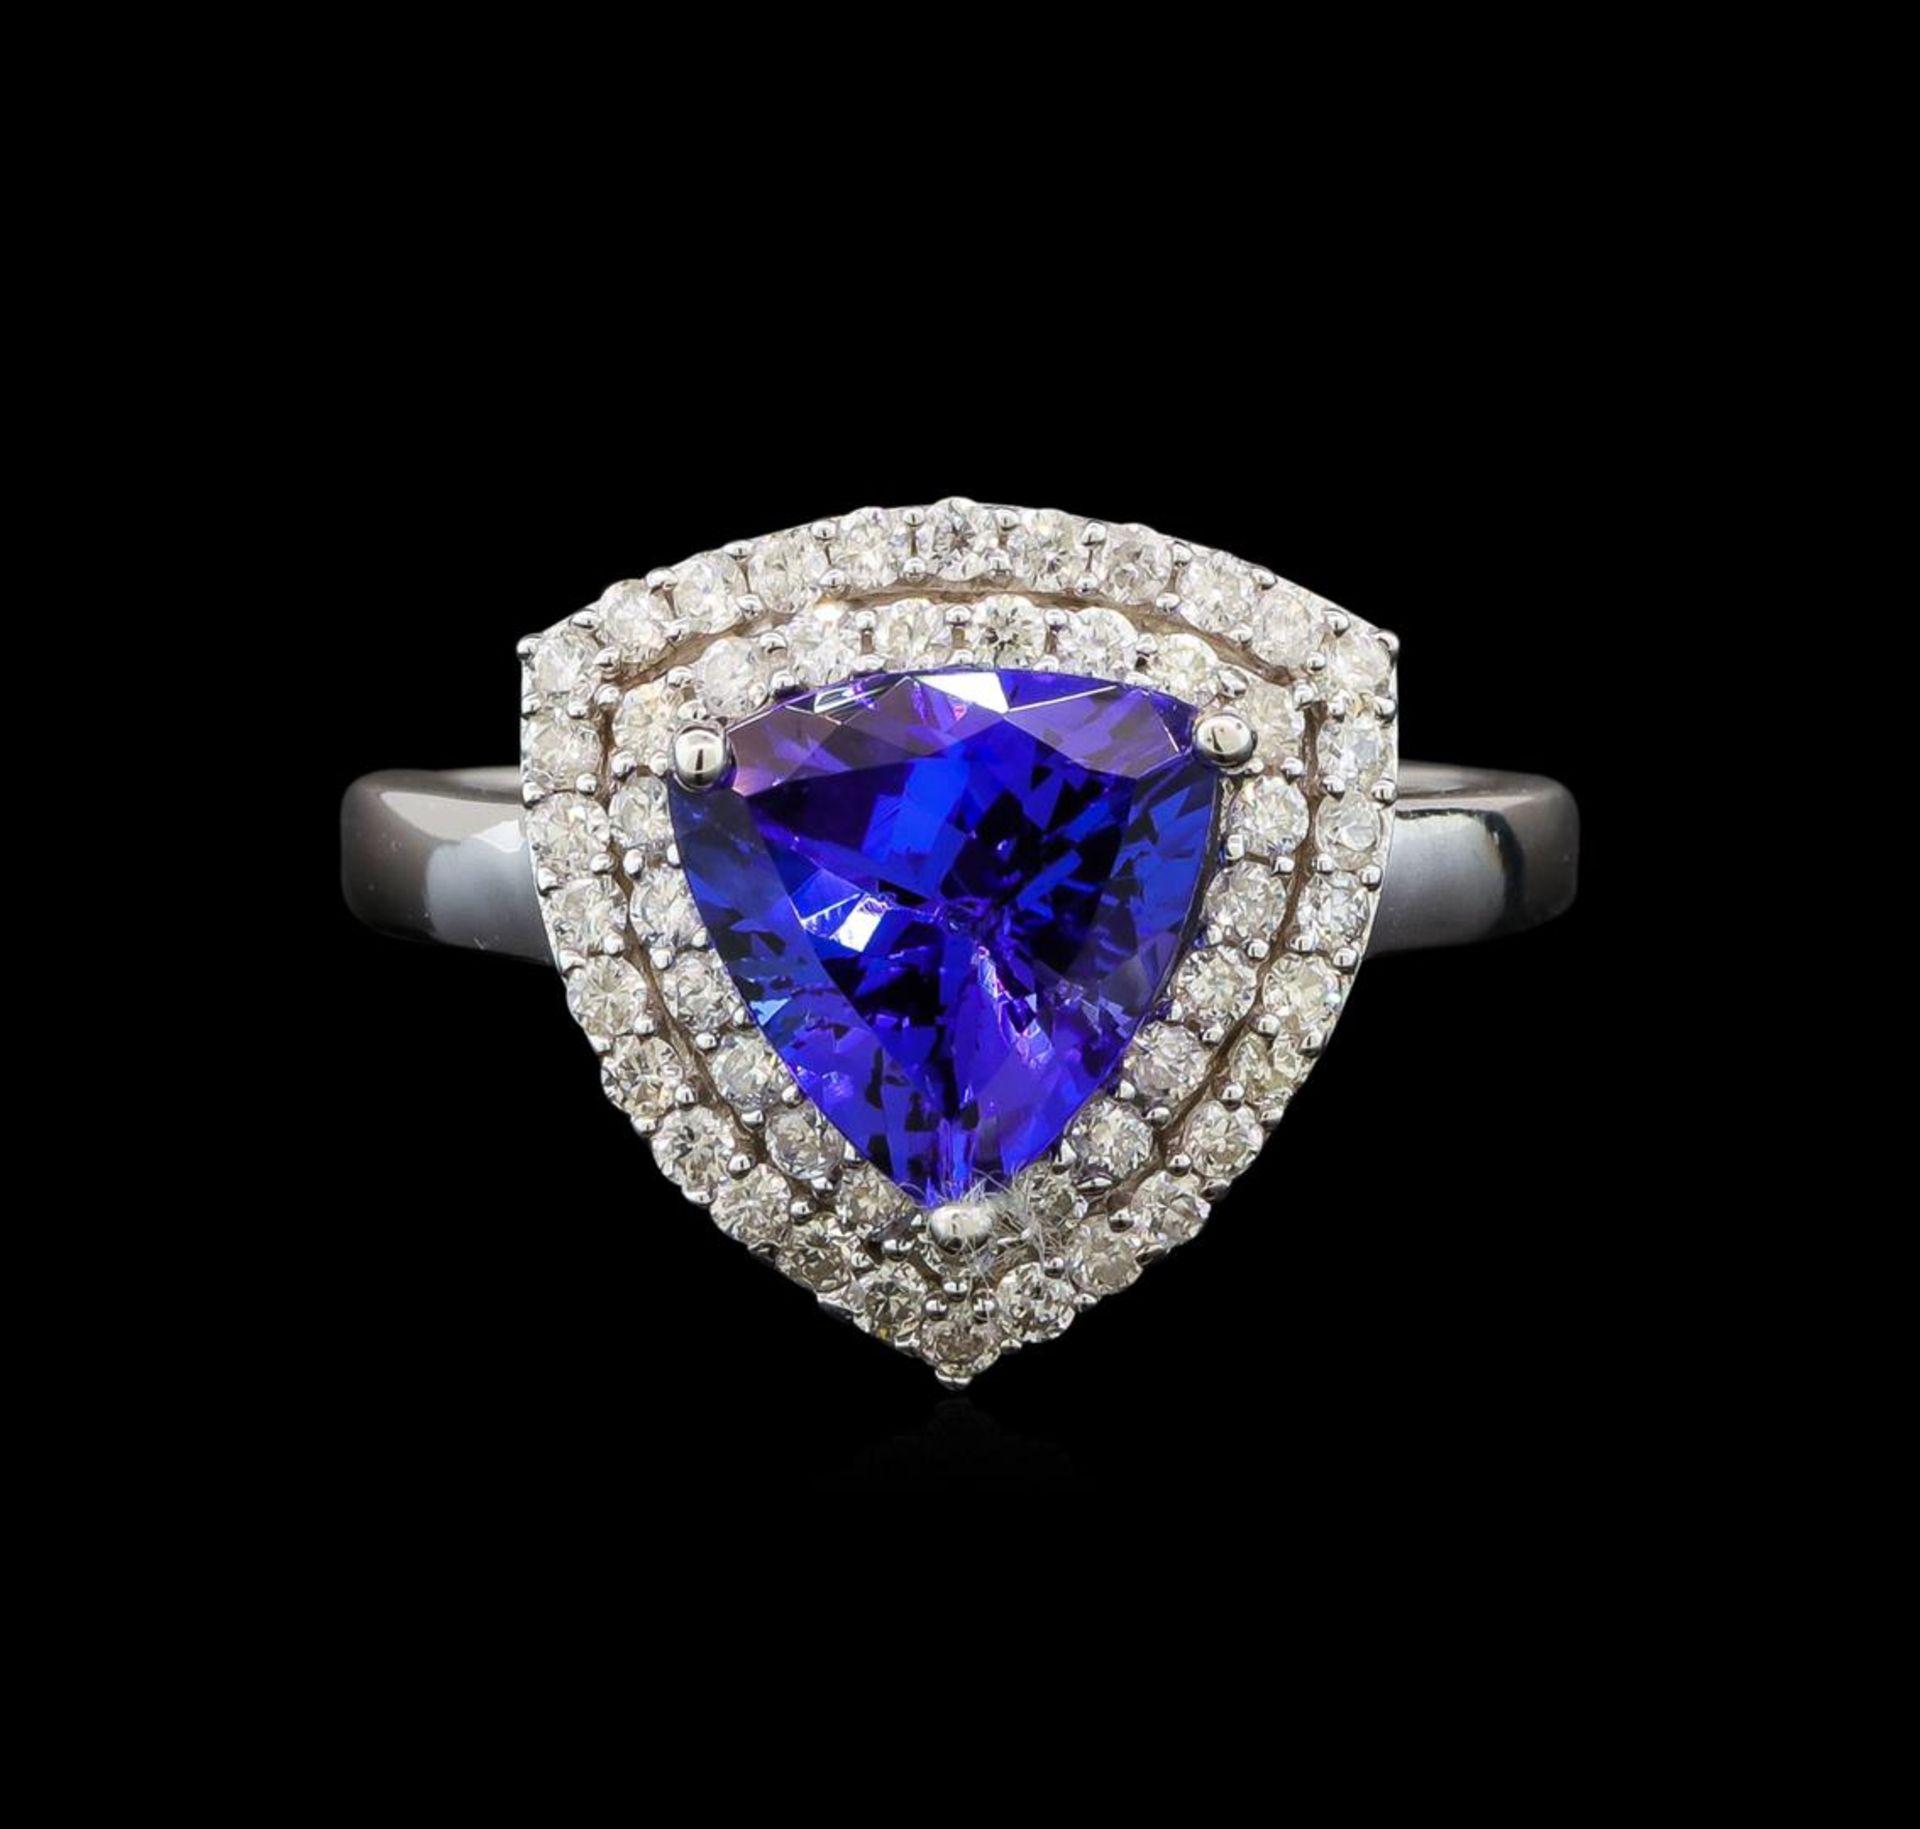 14KT White Gold 2.09 ctw Tanzanite and Diamond Ring - Image 2 of 5